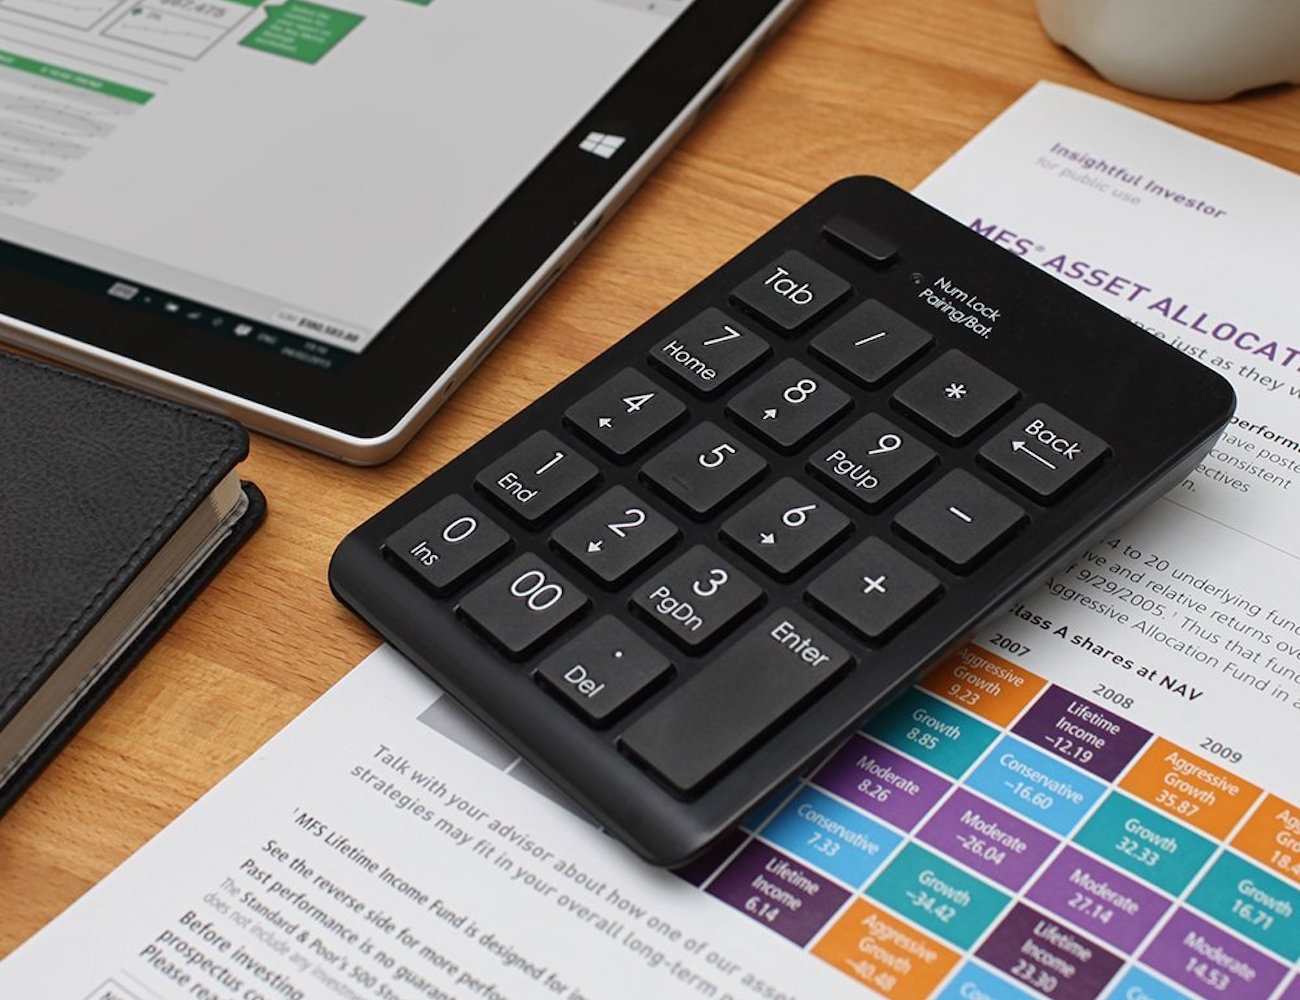 Satechi Bluetooth Wireless williamhill rücktrittskosten williamhill kundenservice email Numeric Keypad